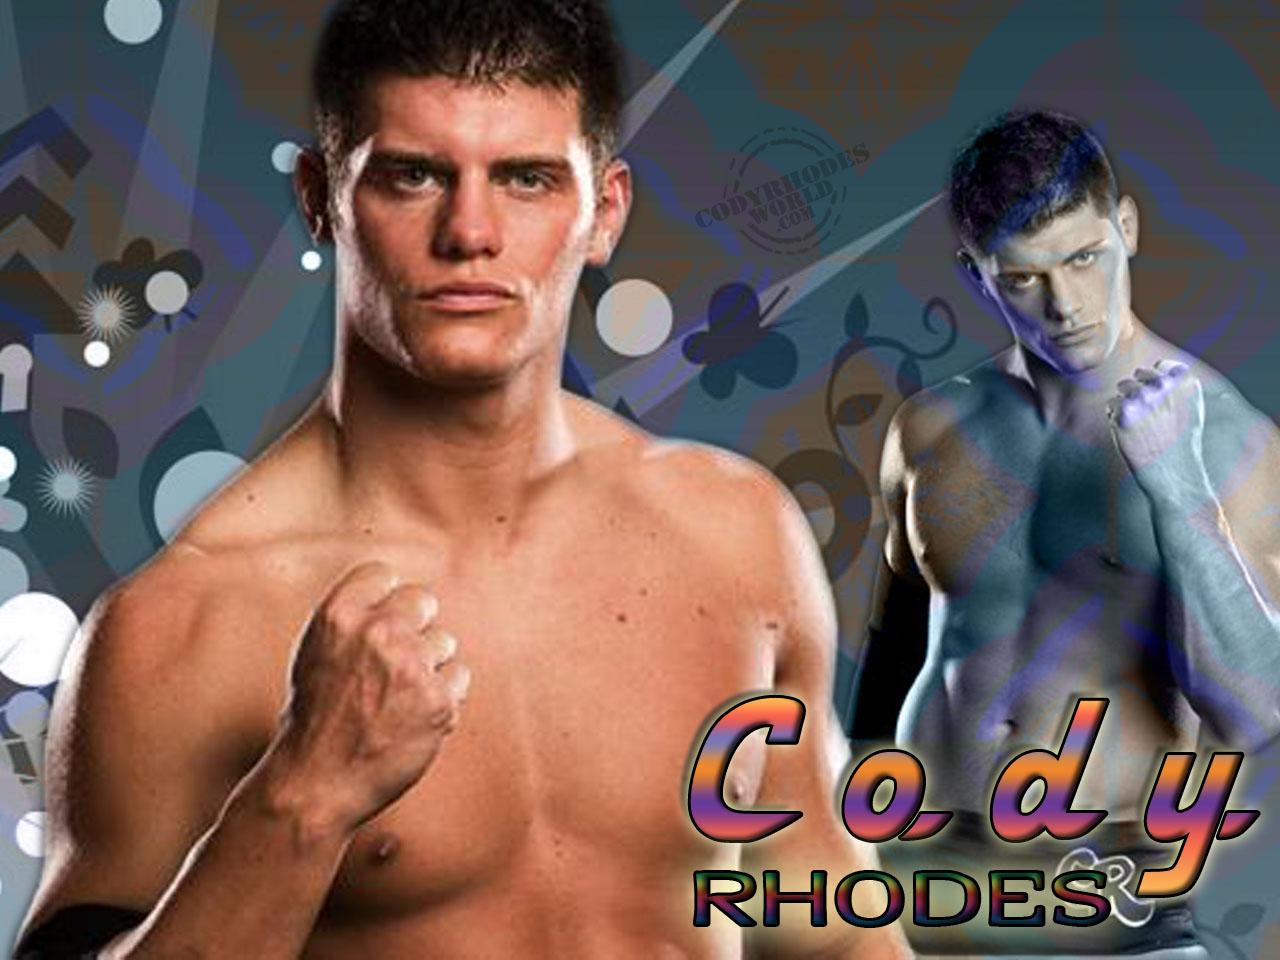 http://2.bp.blogspot.com/-WJXUKpAzdVQ/TkEr5NaYSZI/AAAAAAAAAok/akOZ0t5mTGw/s1600/Cody-Rhodes-Wallpaper-1.jpg